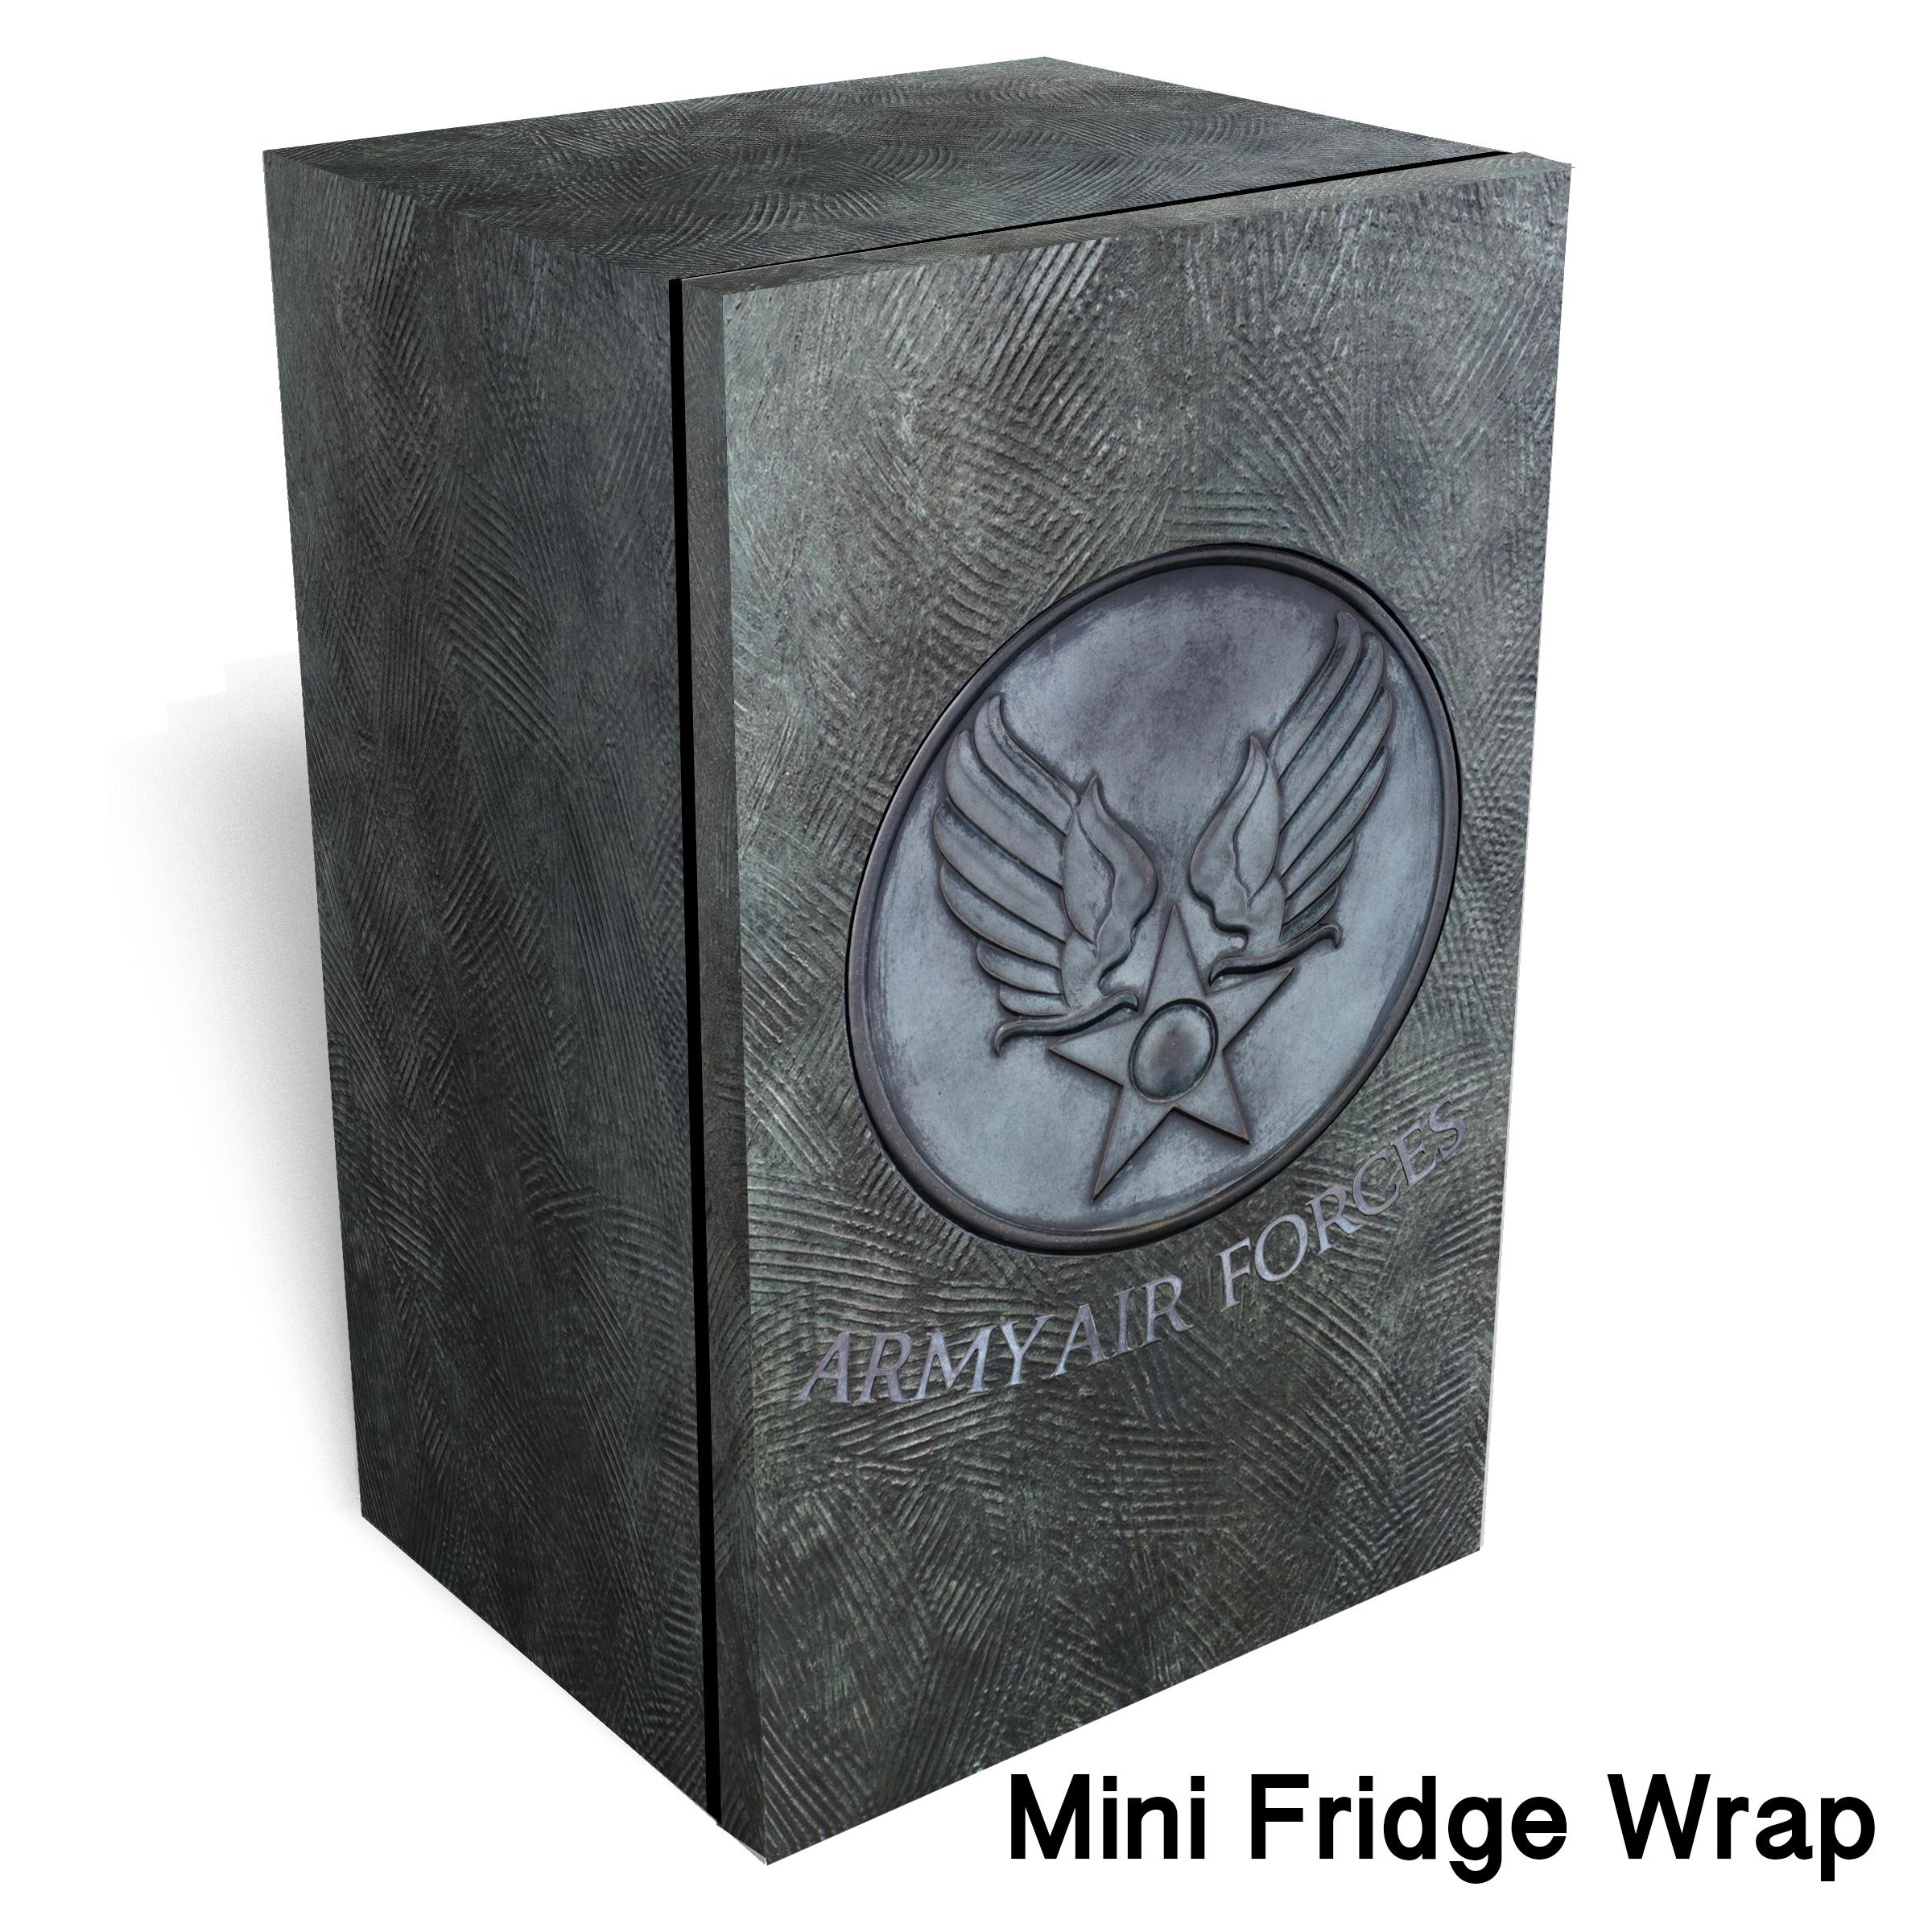 Army air forces Metal logo mini fridge wrap